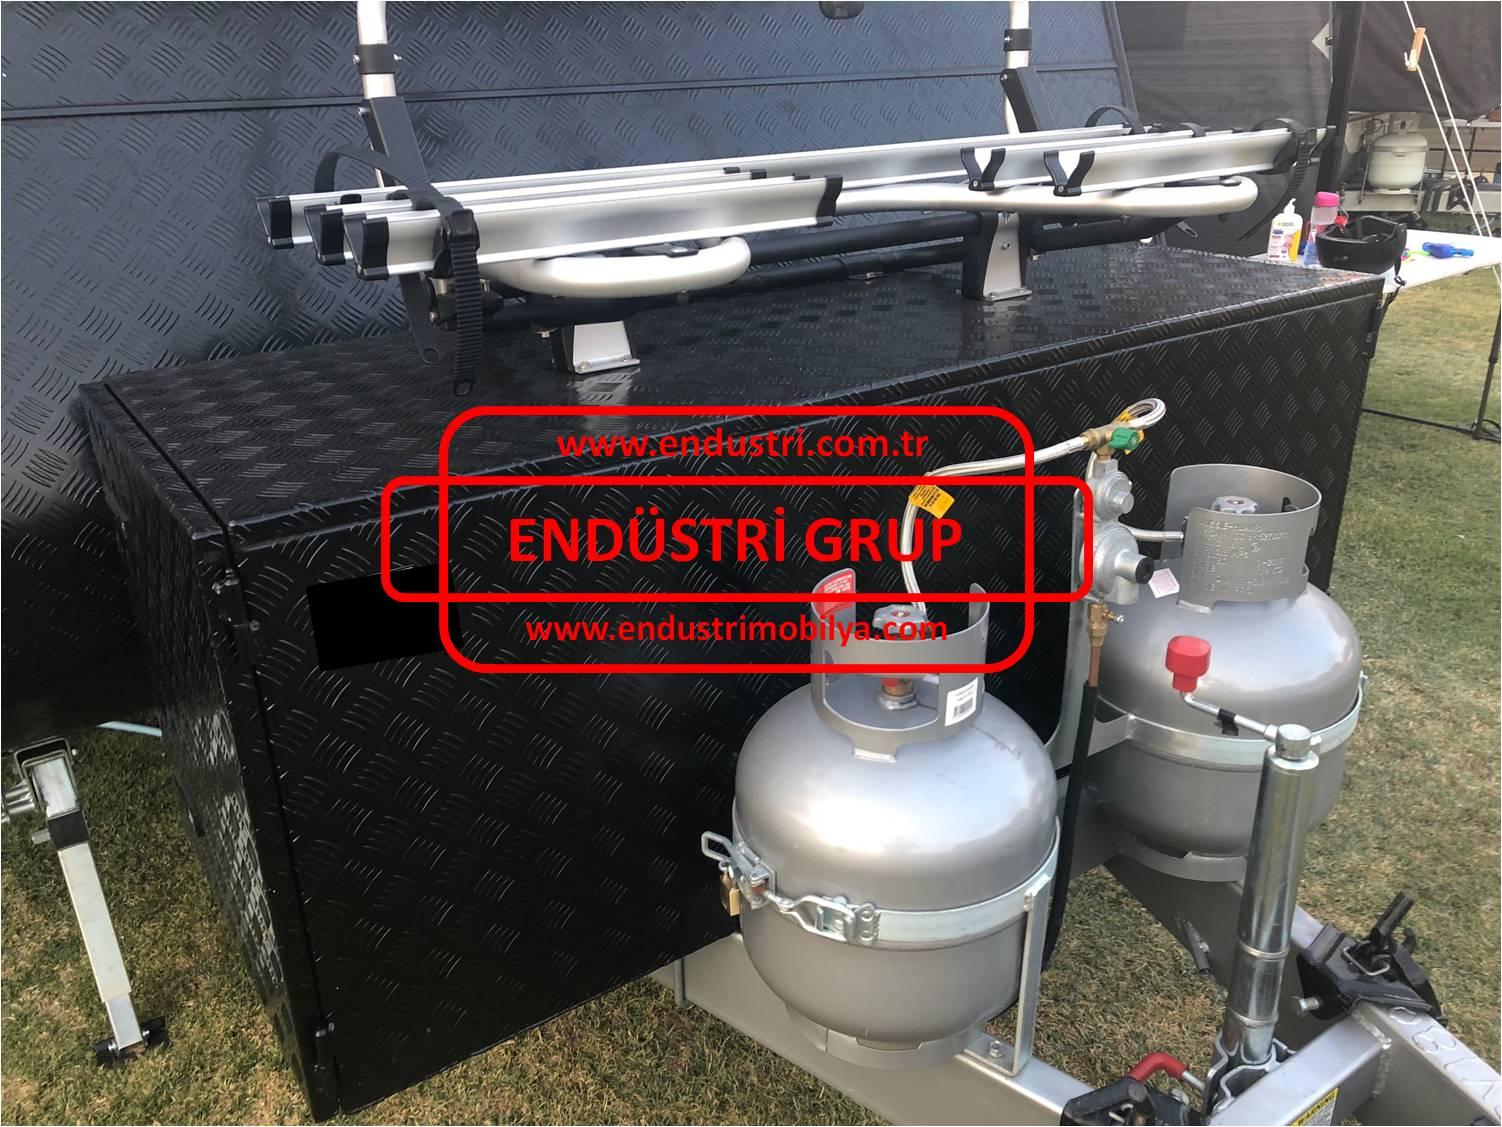 karavan-tipi-tup-sabitleme-tasima-standi-aparati-ekipmani-modelleri-fiyati.